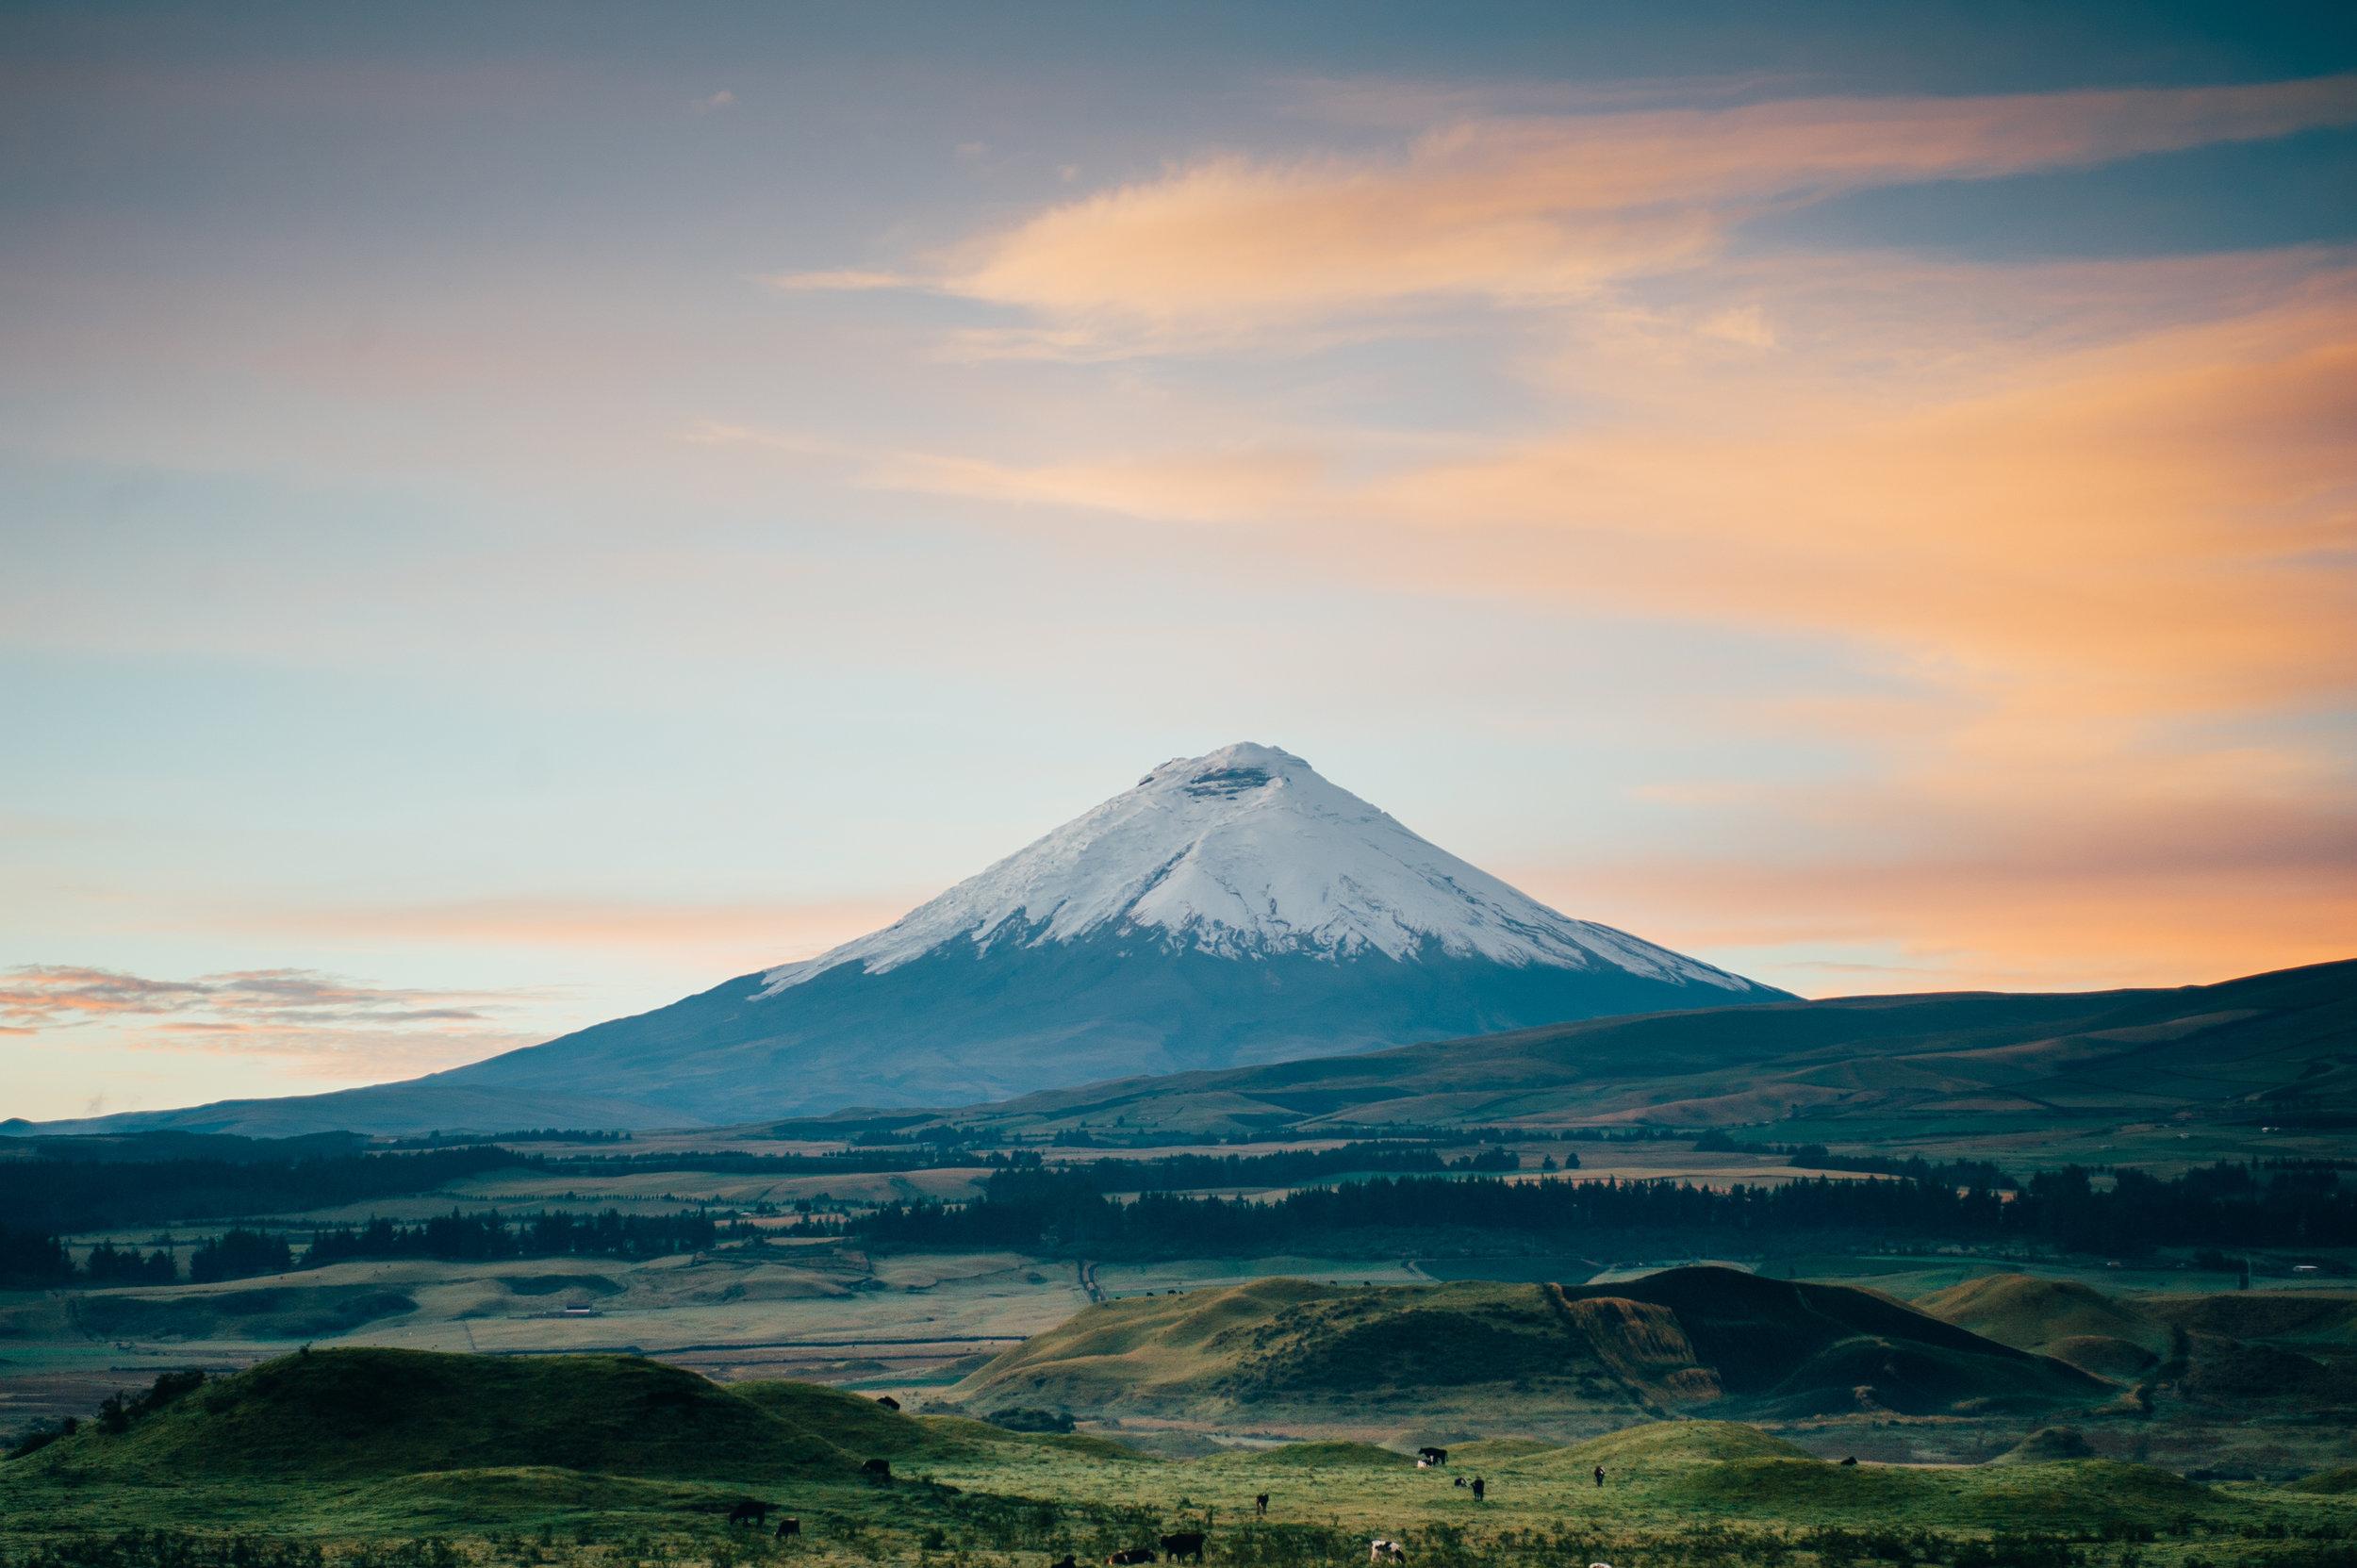 beautiful_landscape_cotopaxi_by_jeremiah_alley.jpg